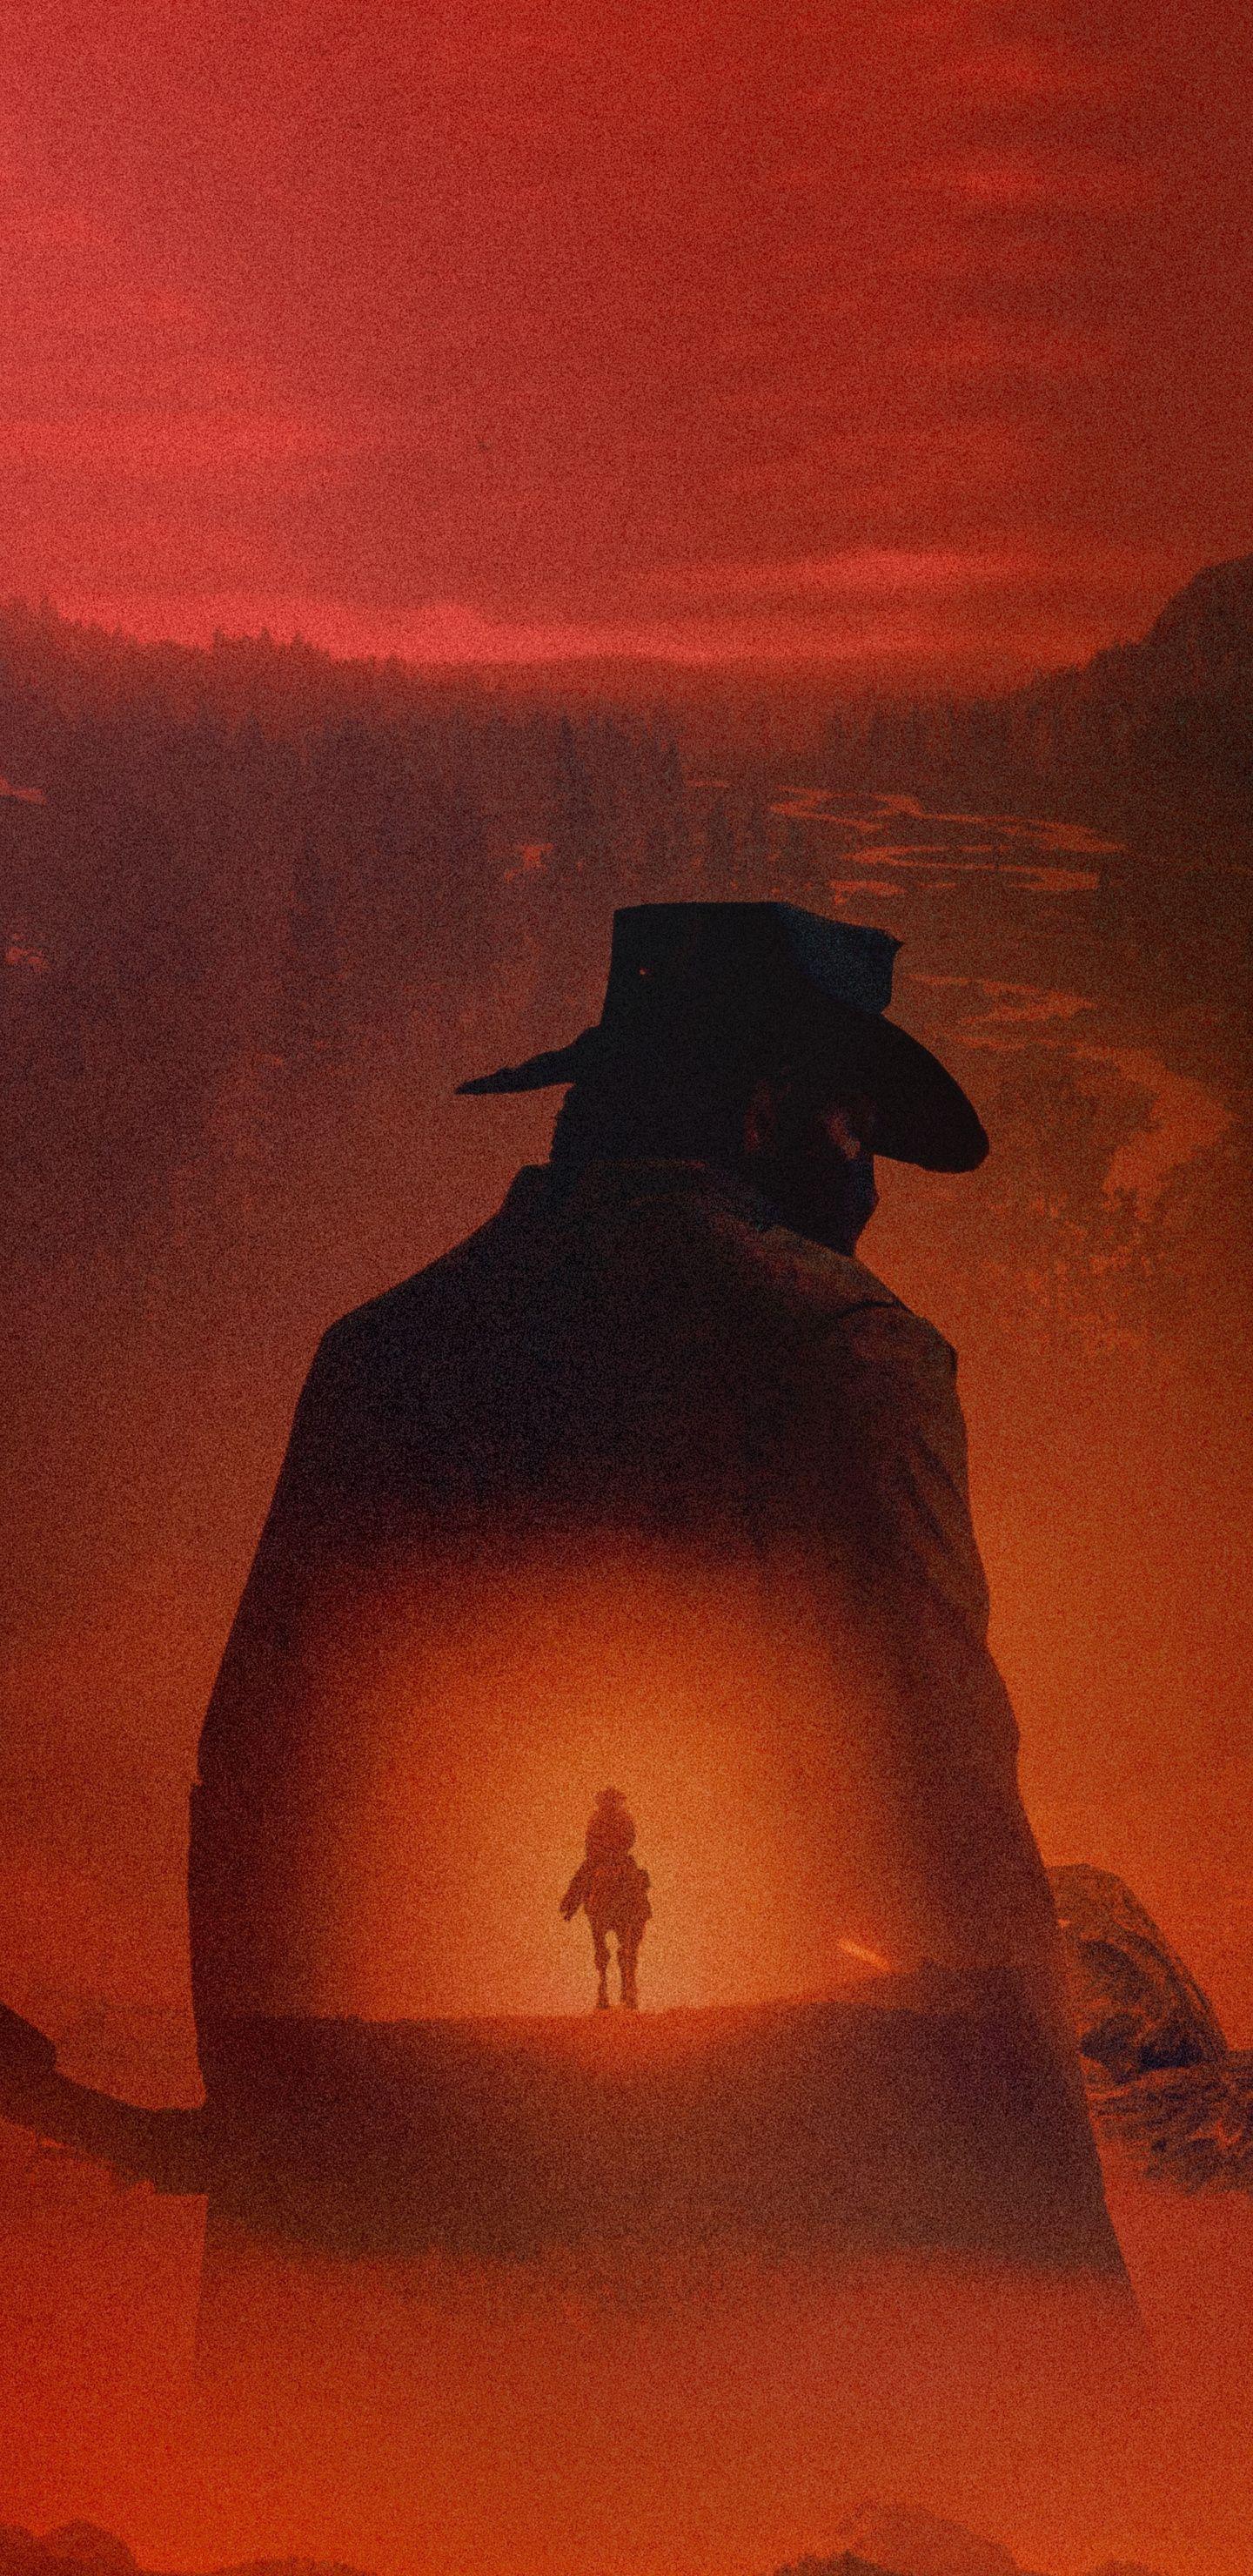 2018 Red Dead Redemption 2 Cowboy Poster 1440x2960 Wallpaper Red Dead Redemption Art Red Dead Redemption Ii Red Dead Redemption